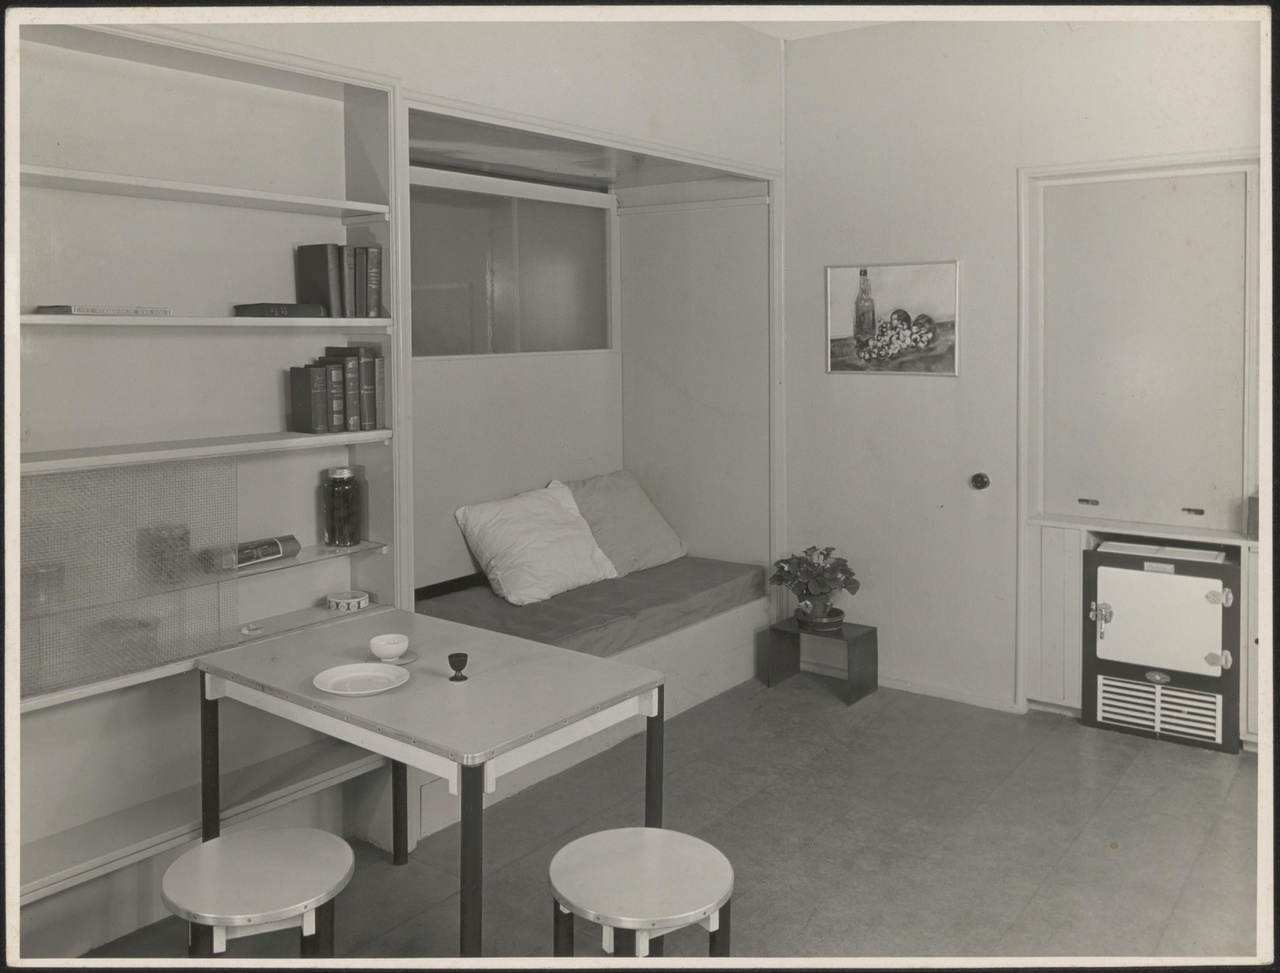 Afbeelding van villa Kenaupark 6, Haarlem, appartement O, hoek met ingebouwde zit/slaapbank